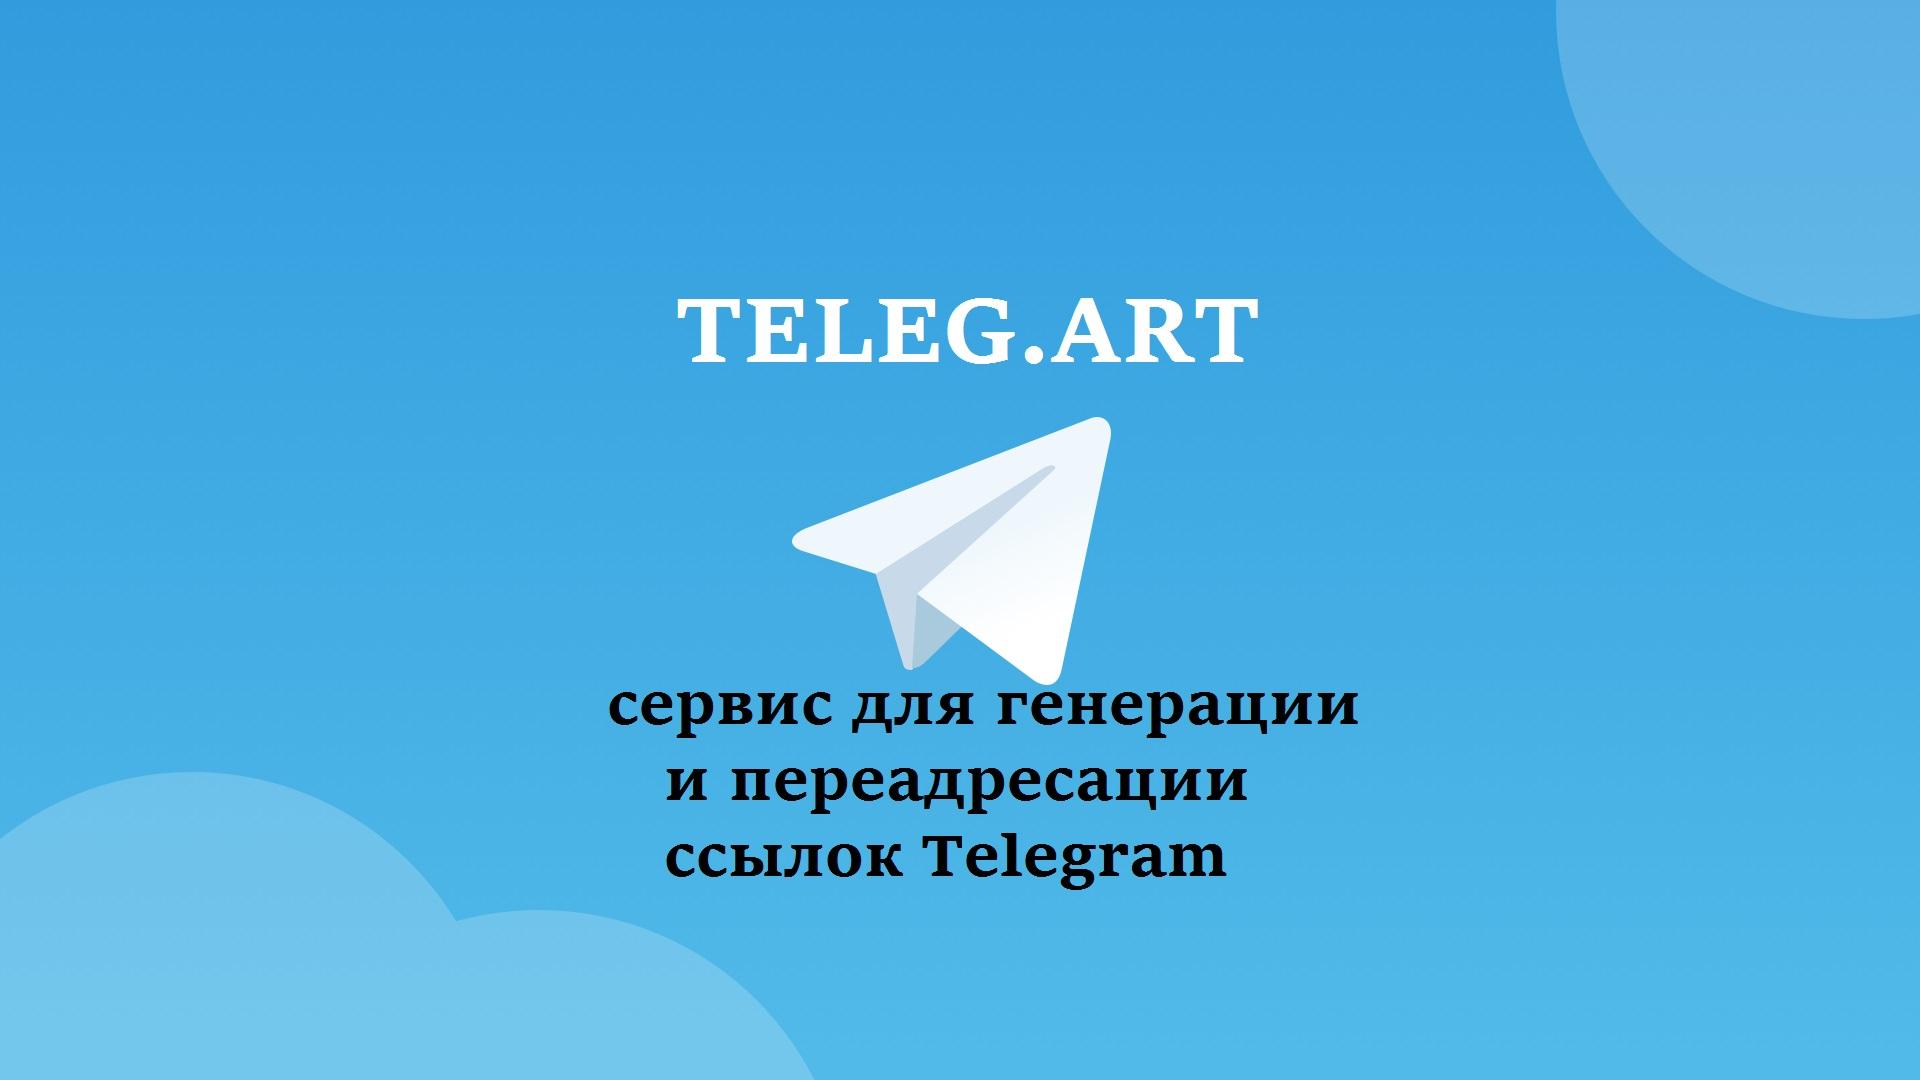 teleg.art